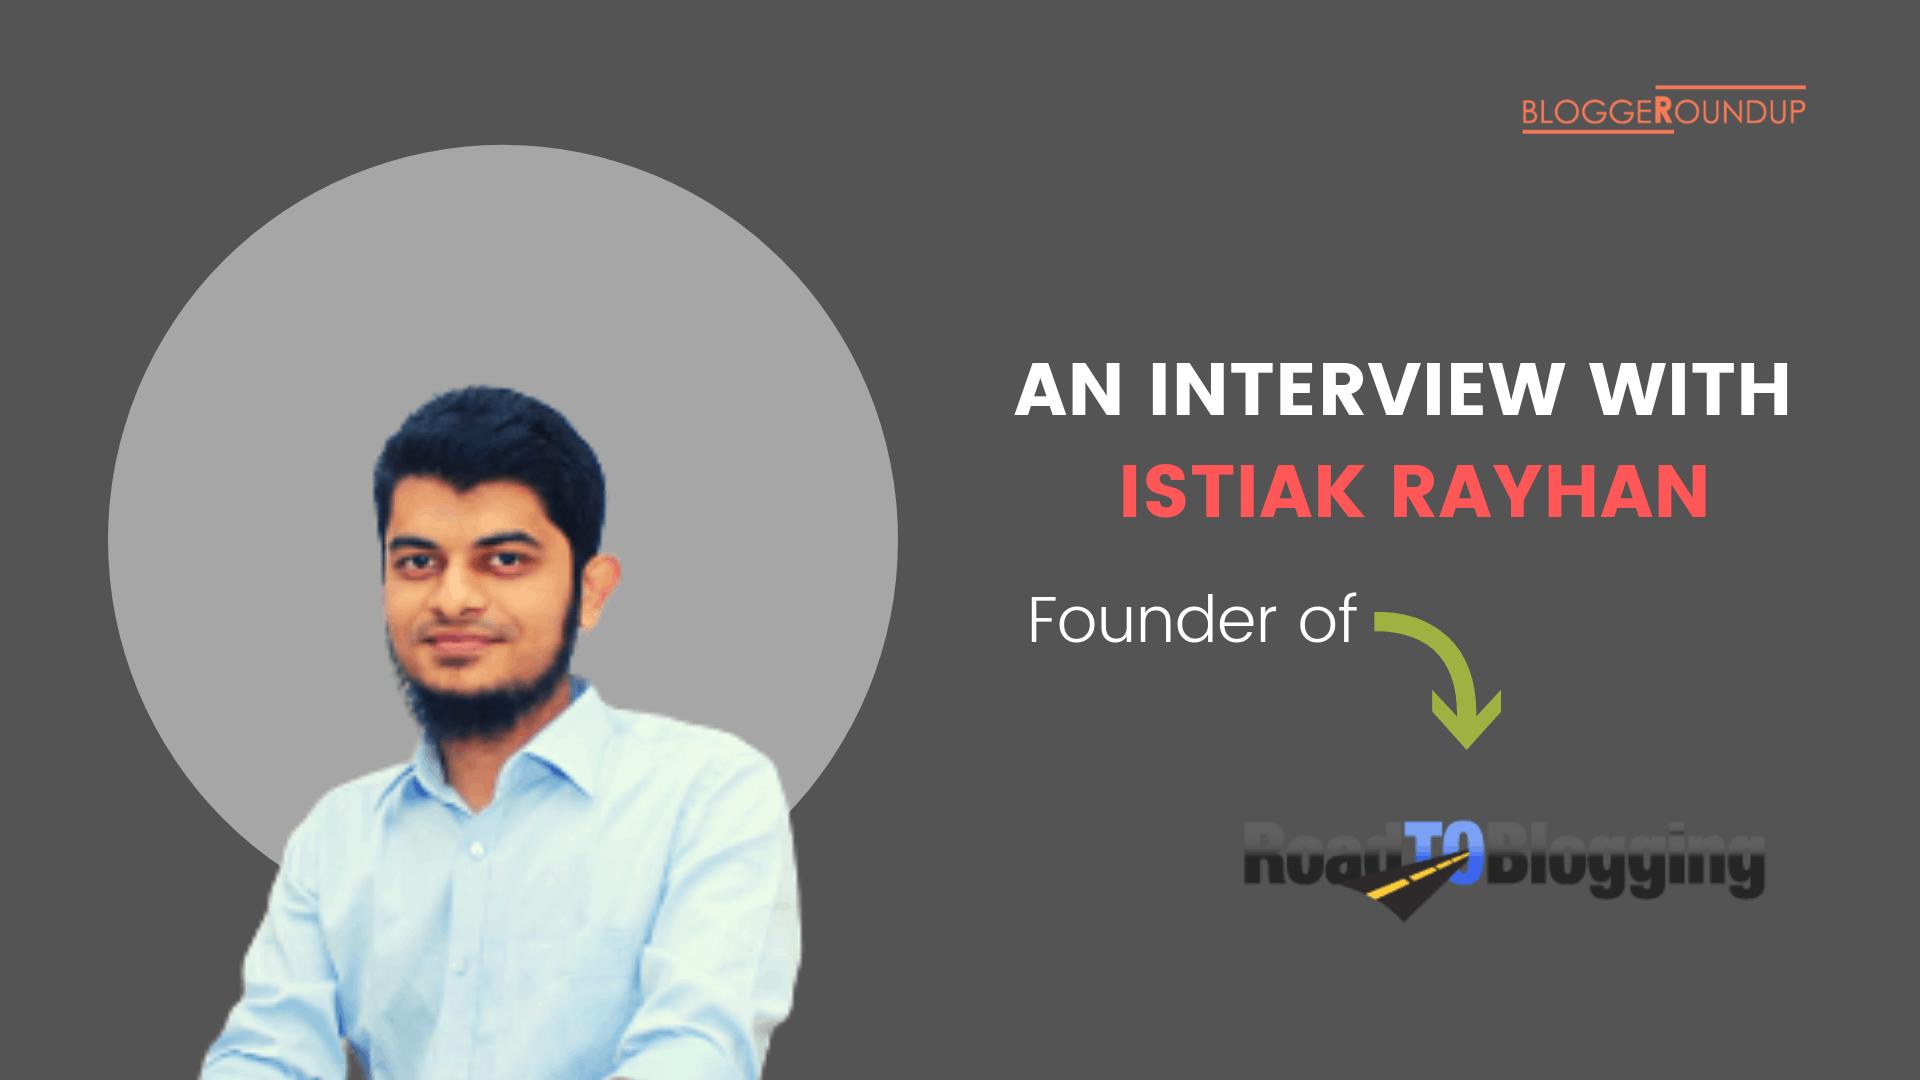 An Interview with Istiak Rayhan